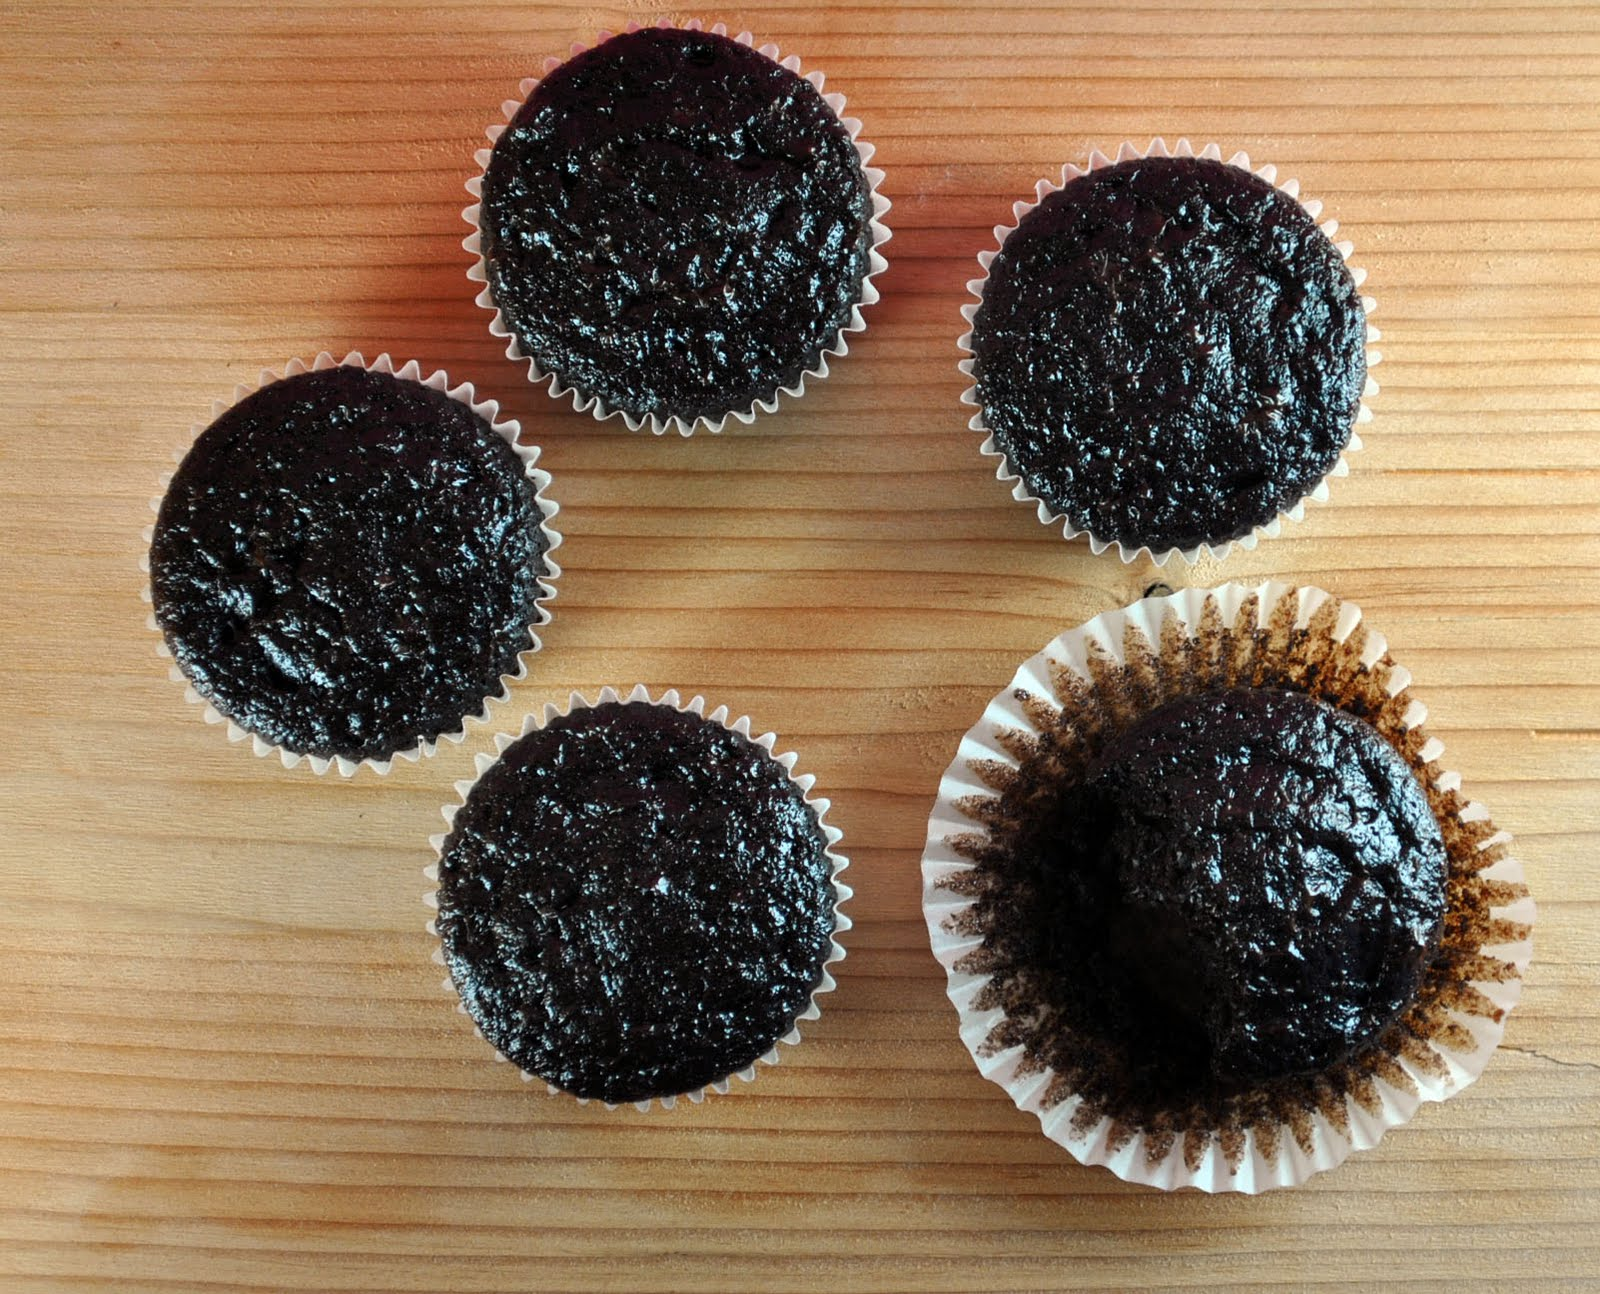 Cupcake Baking 101: The Best Chocolate Cupcake Recipe! - Bake Happy